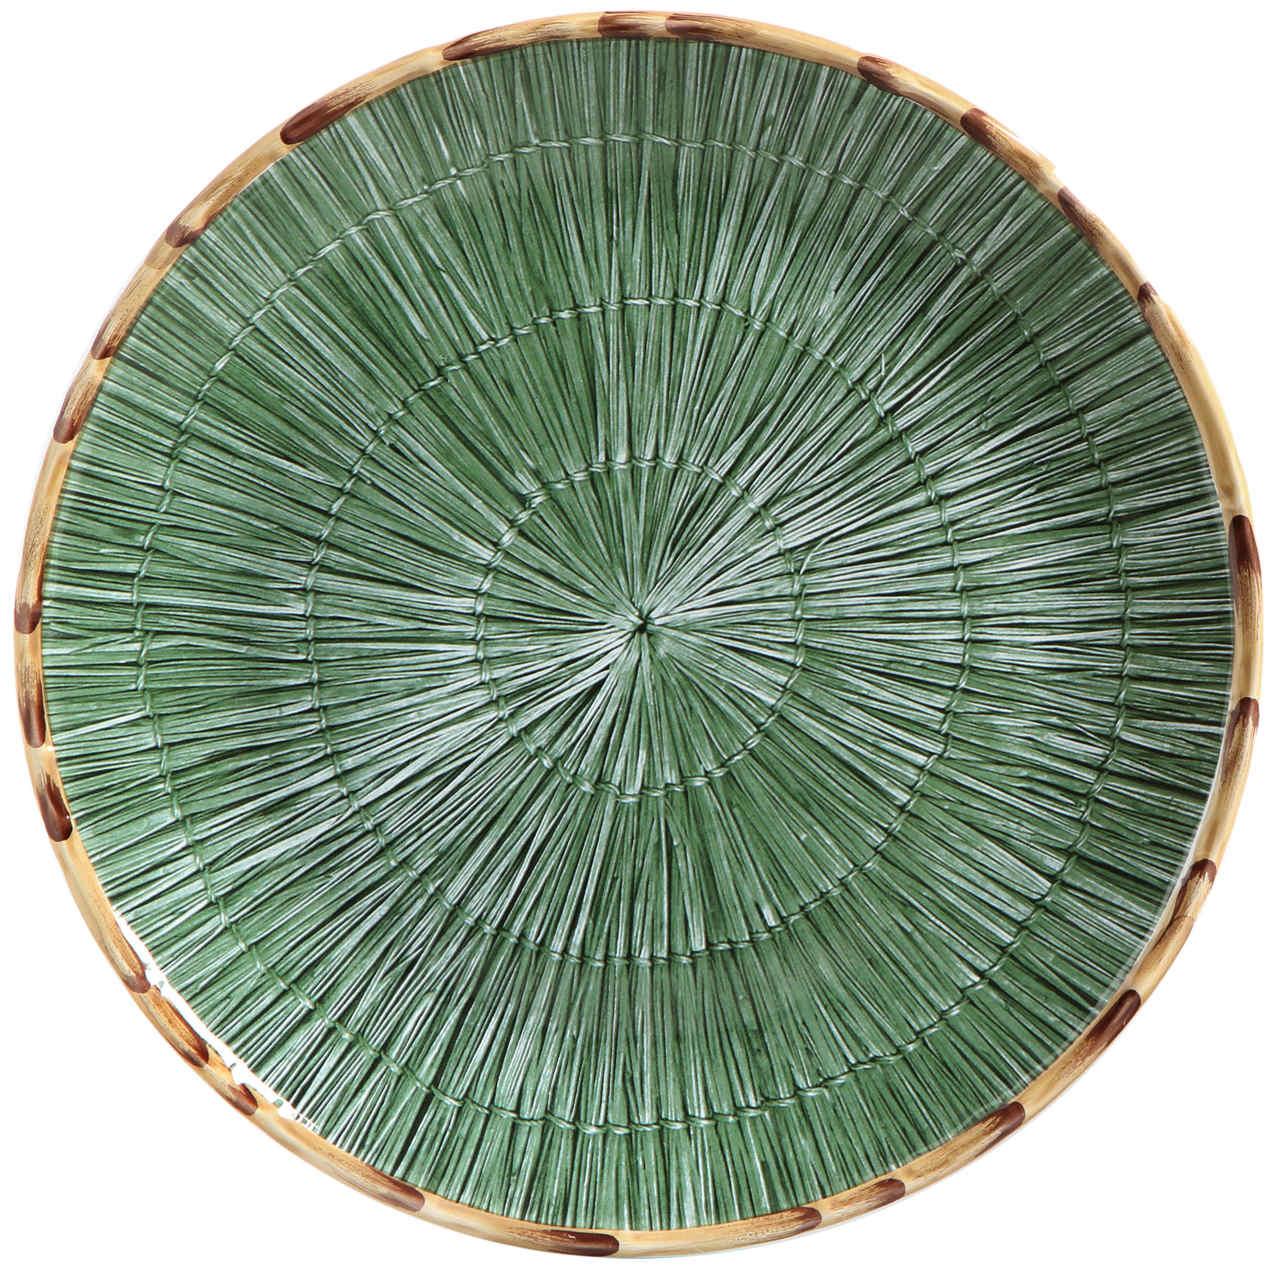 Sousplat Palha Verde (06 Unidades) - MB